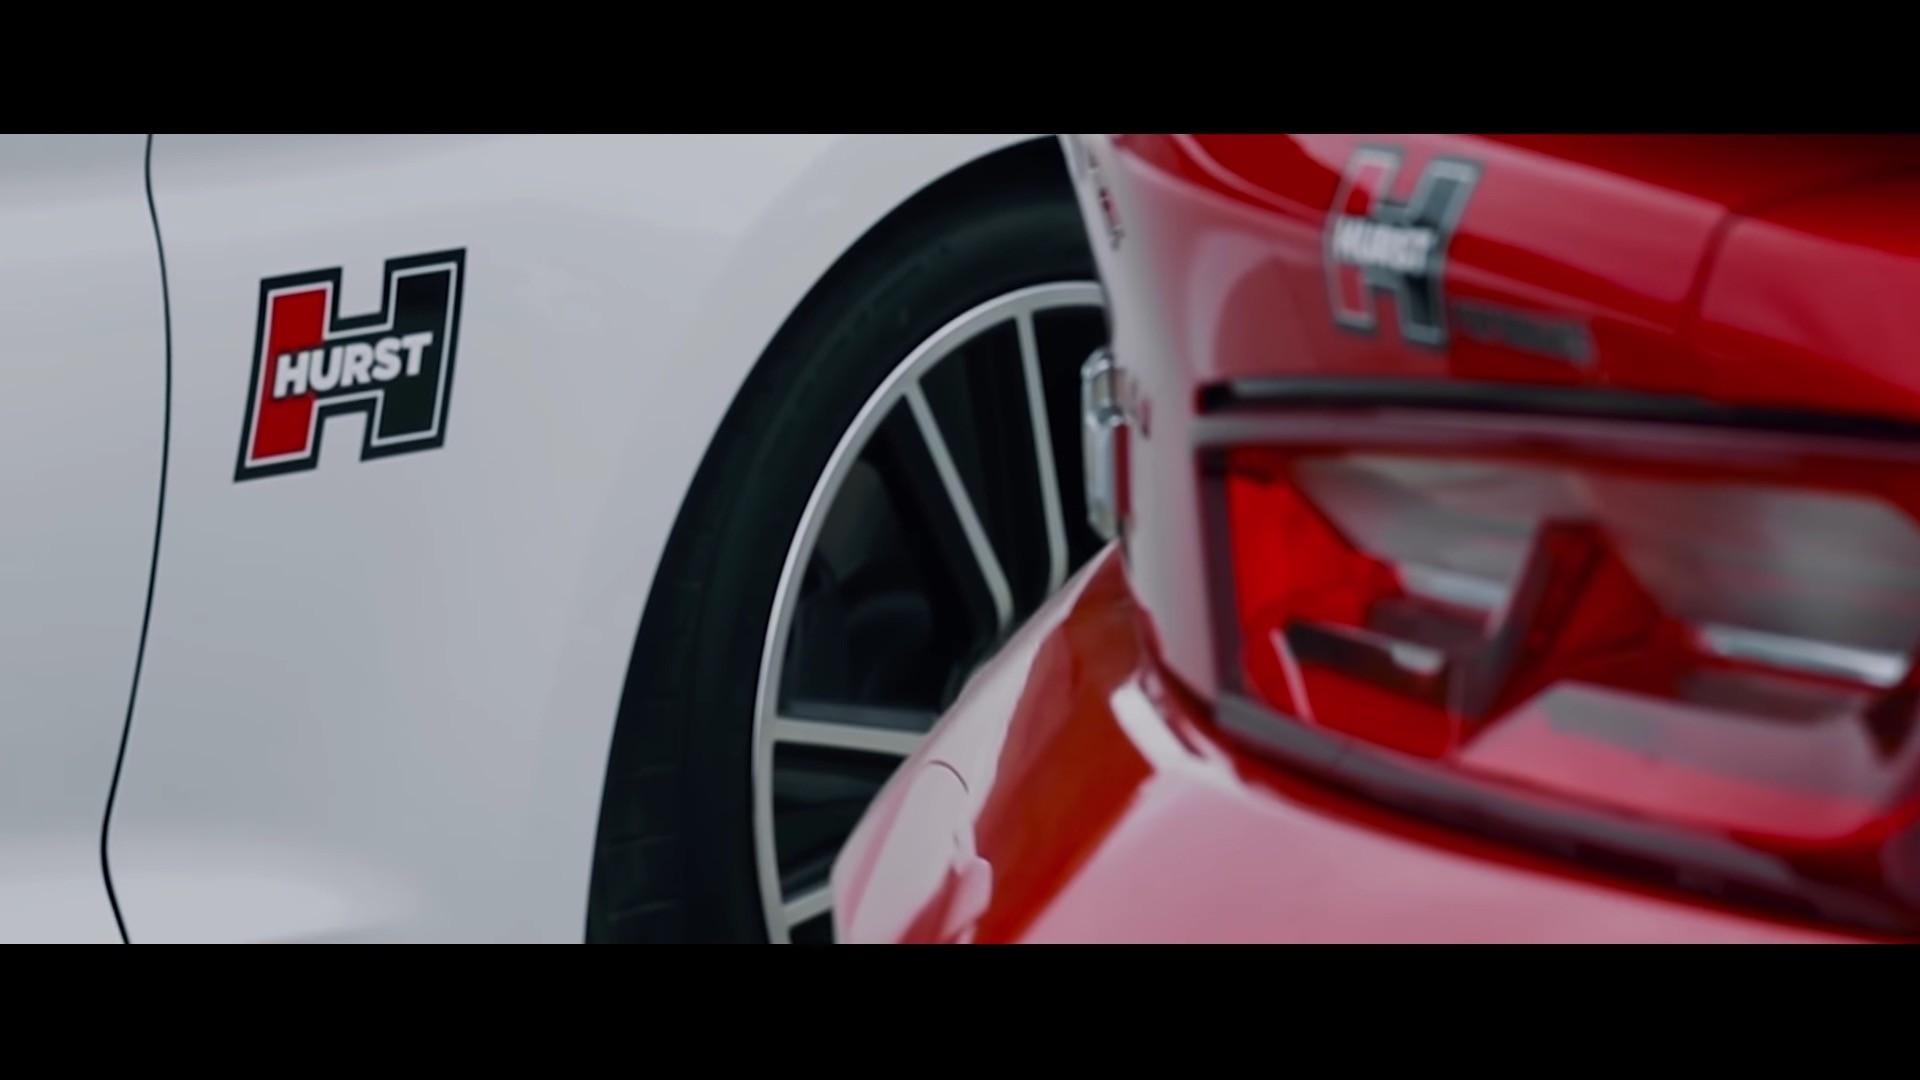 Hurst Performance Pontiac G8 in the Works - autoevolution